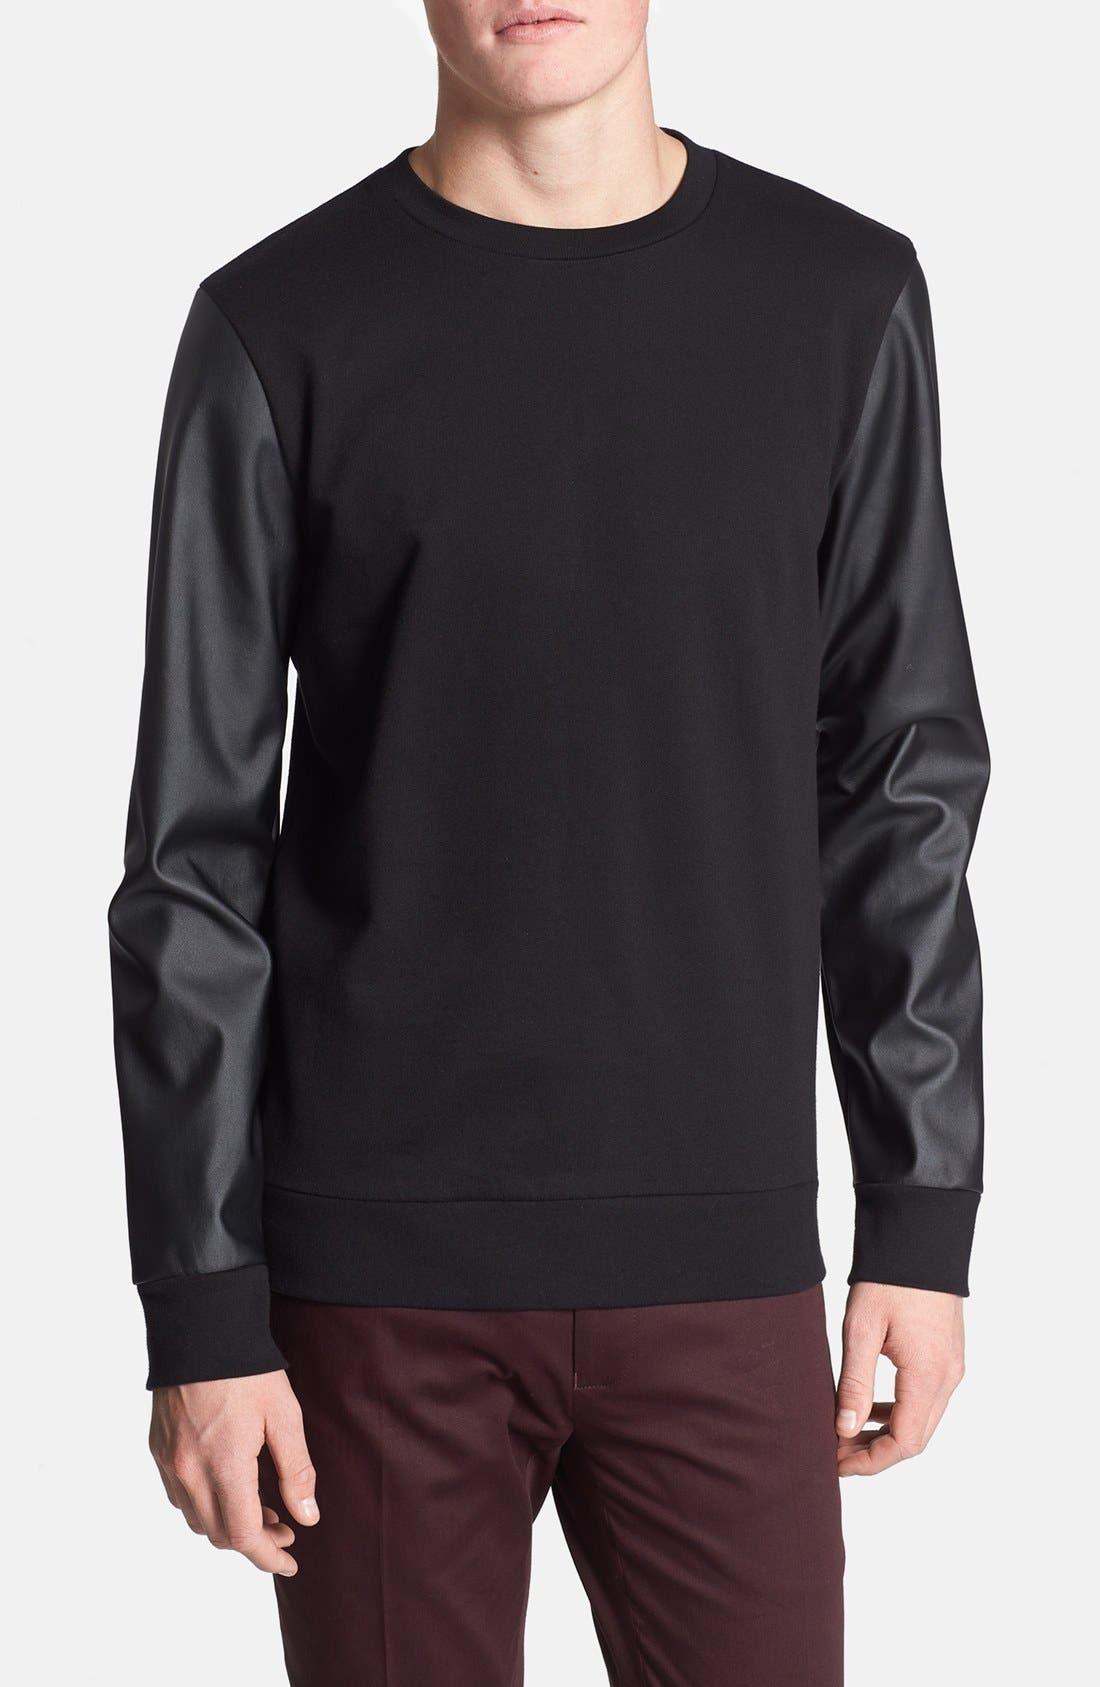 Alternate Image 1 Selected - Topman Faux Leather Sleeve Crewneck Sweatshirt